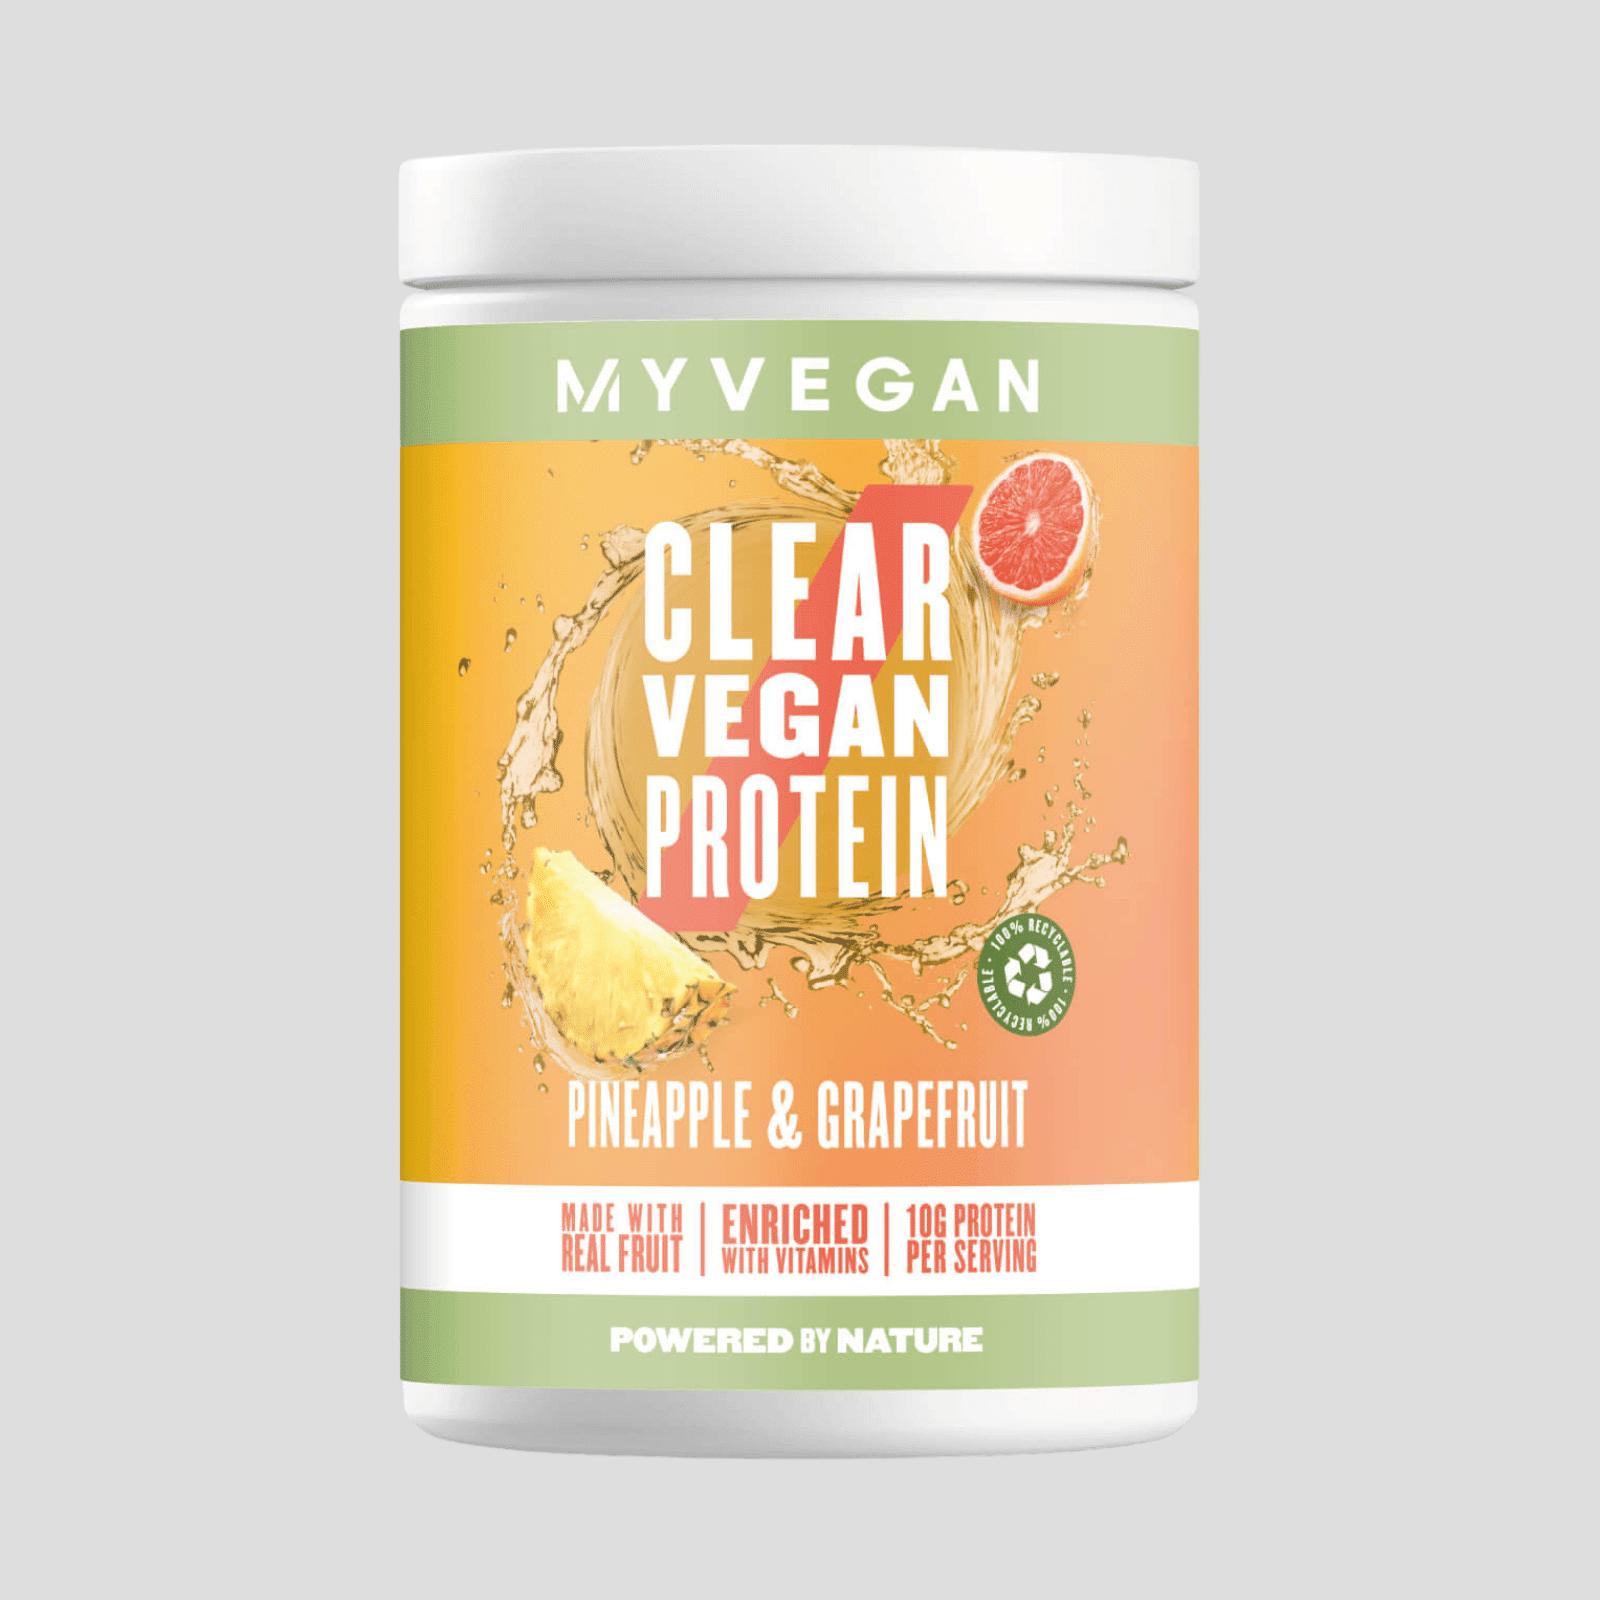 Myvegan Clear Vegan Protein - 20servings - Pineapple & Grapefruit